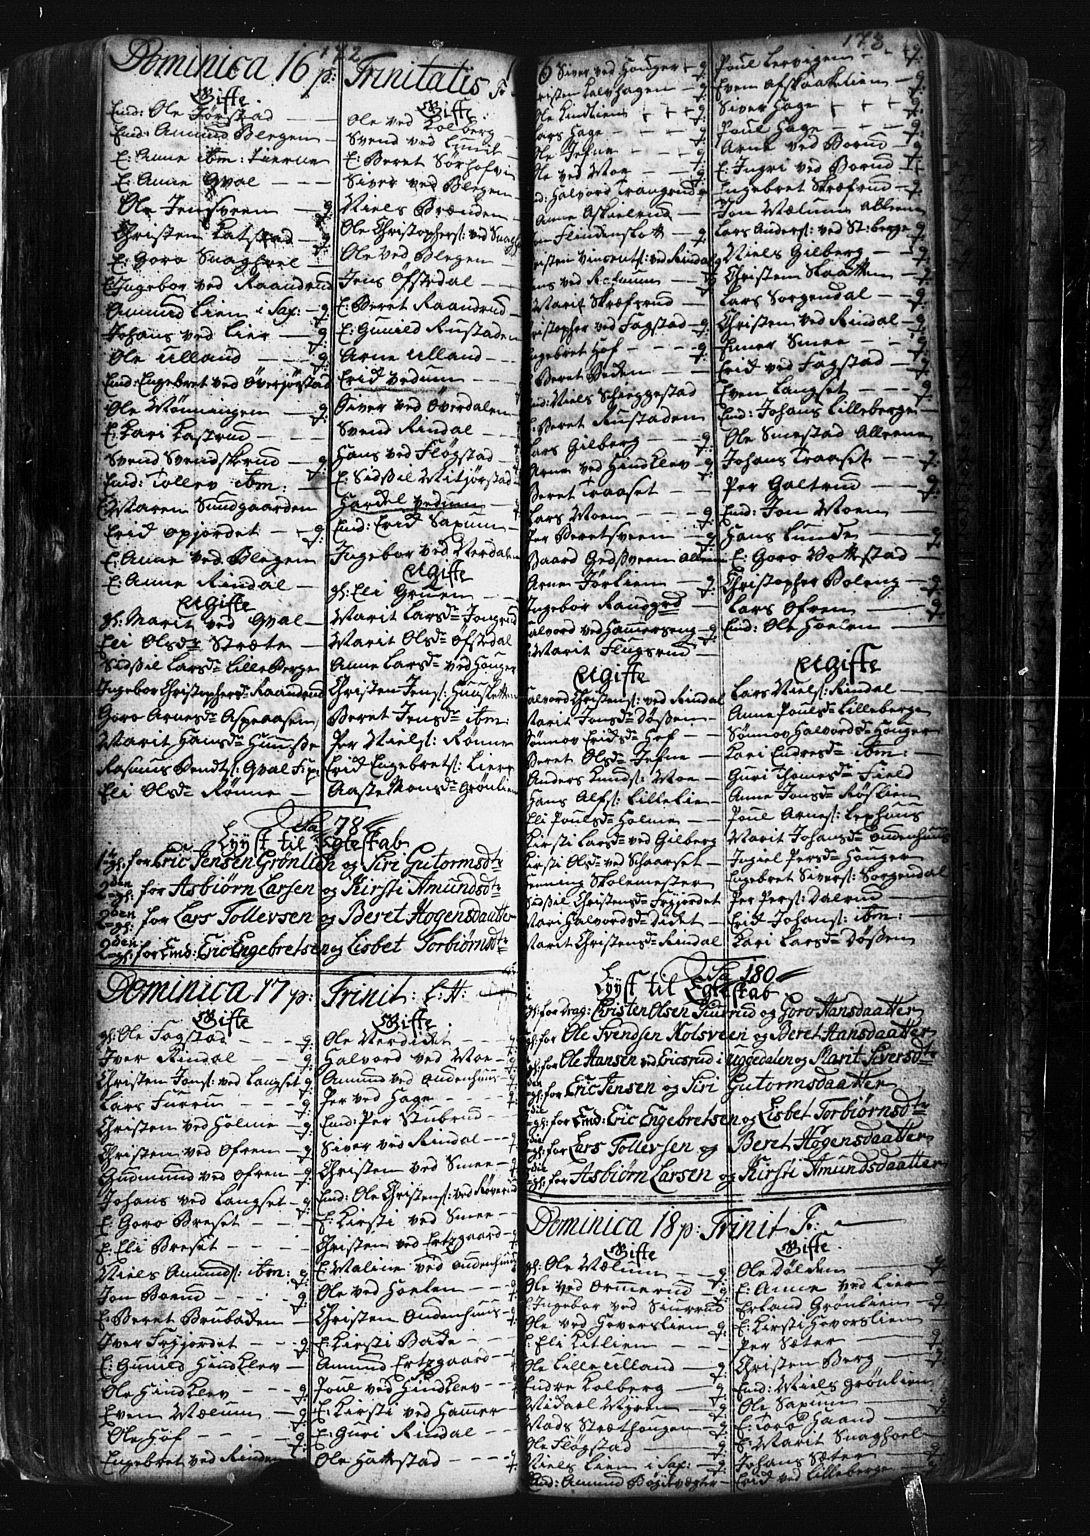 SAH, Fåberg prestekontor, Klokkerbok nr. 1, 1727-1767, s. 172-173